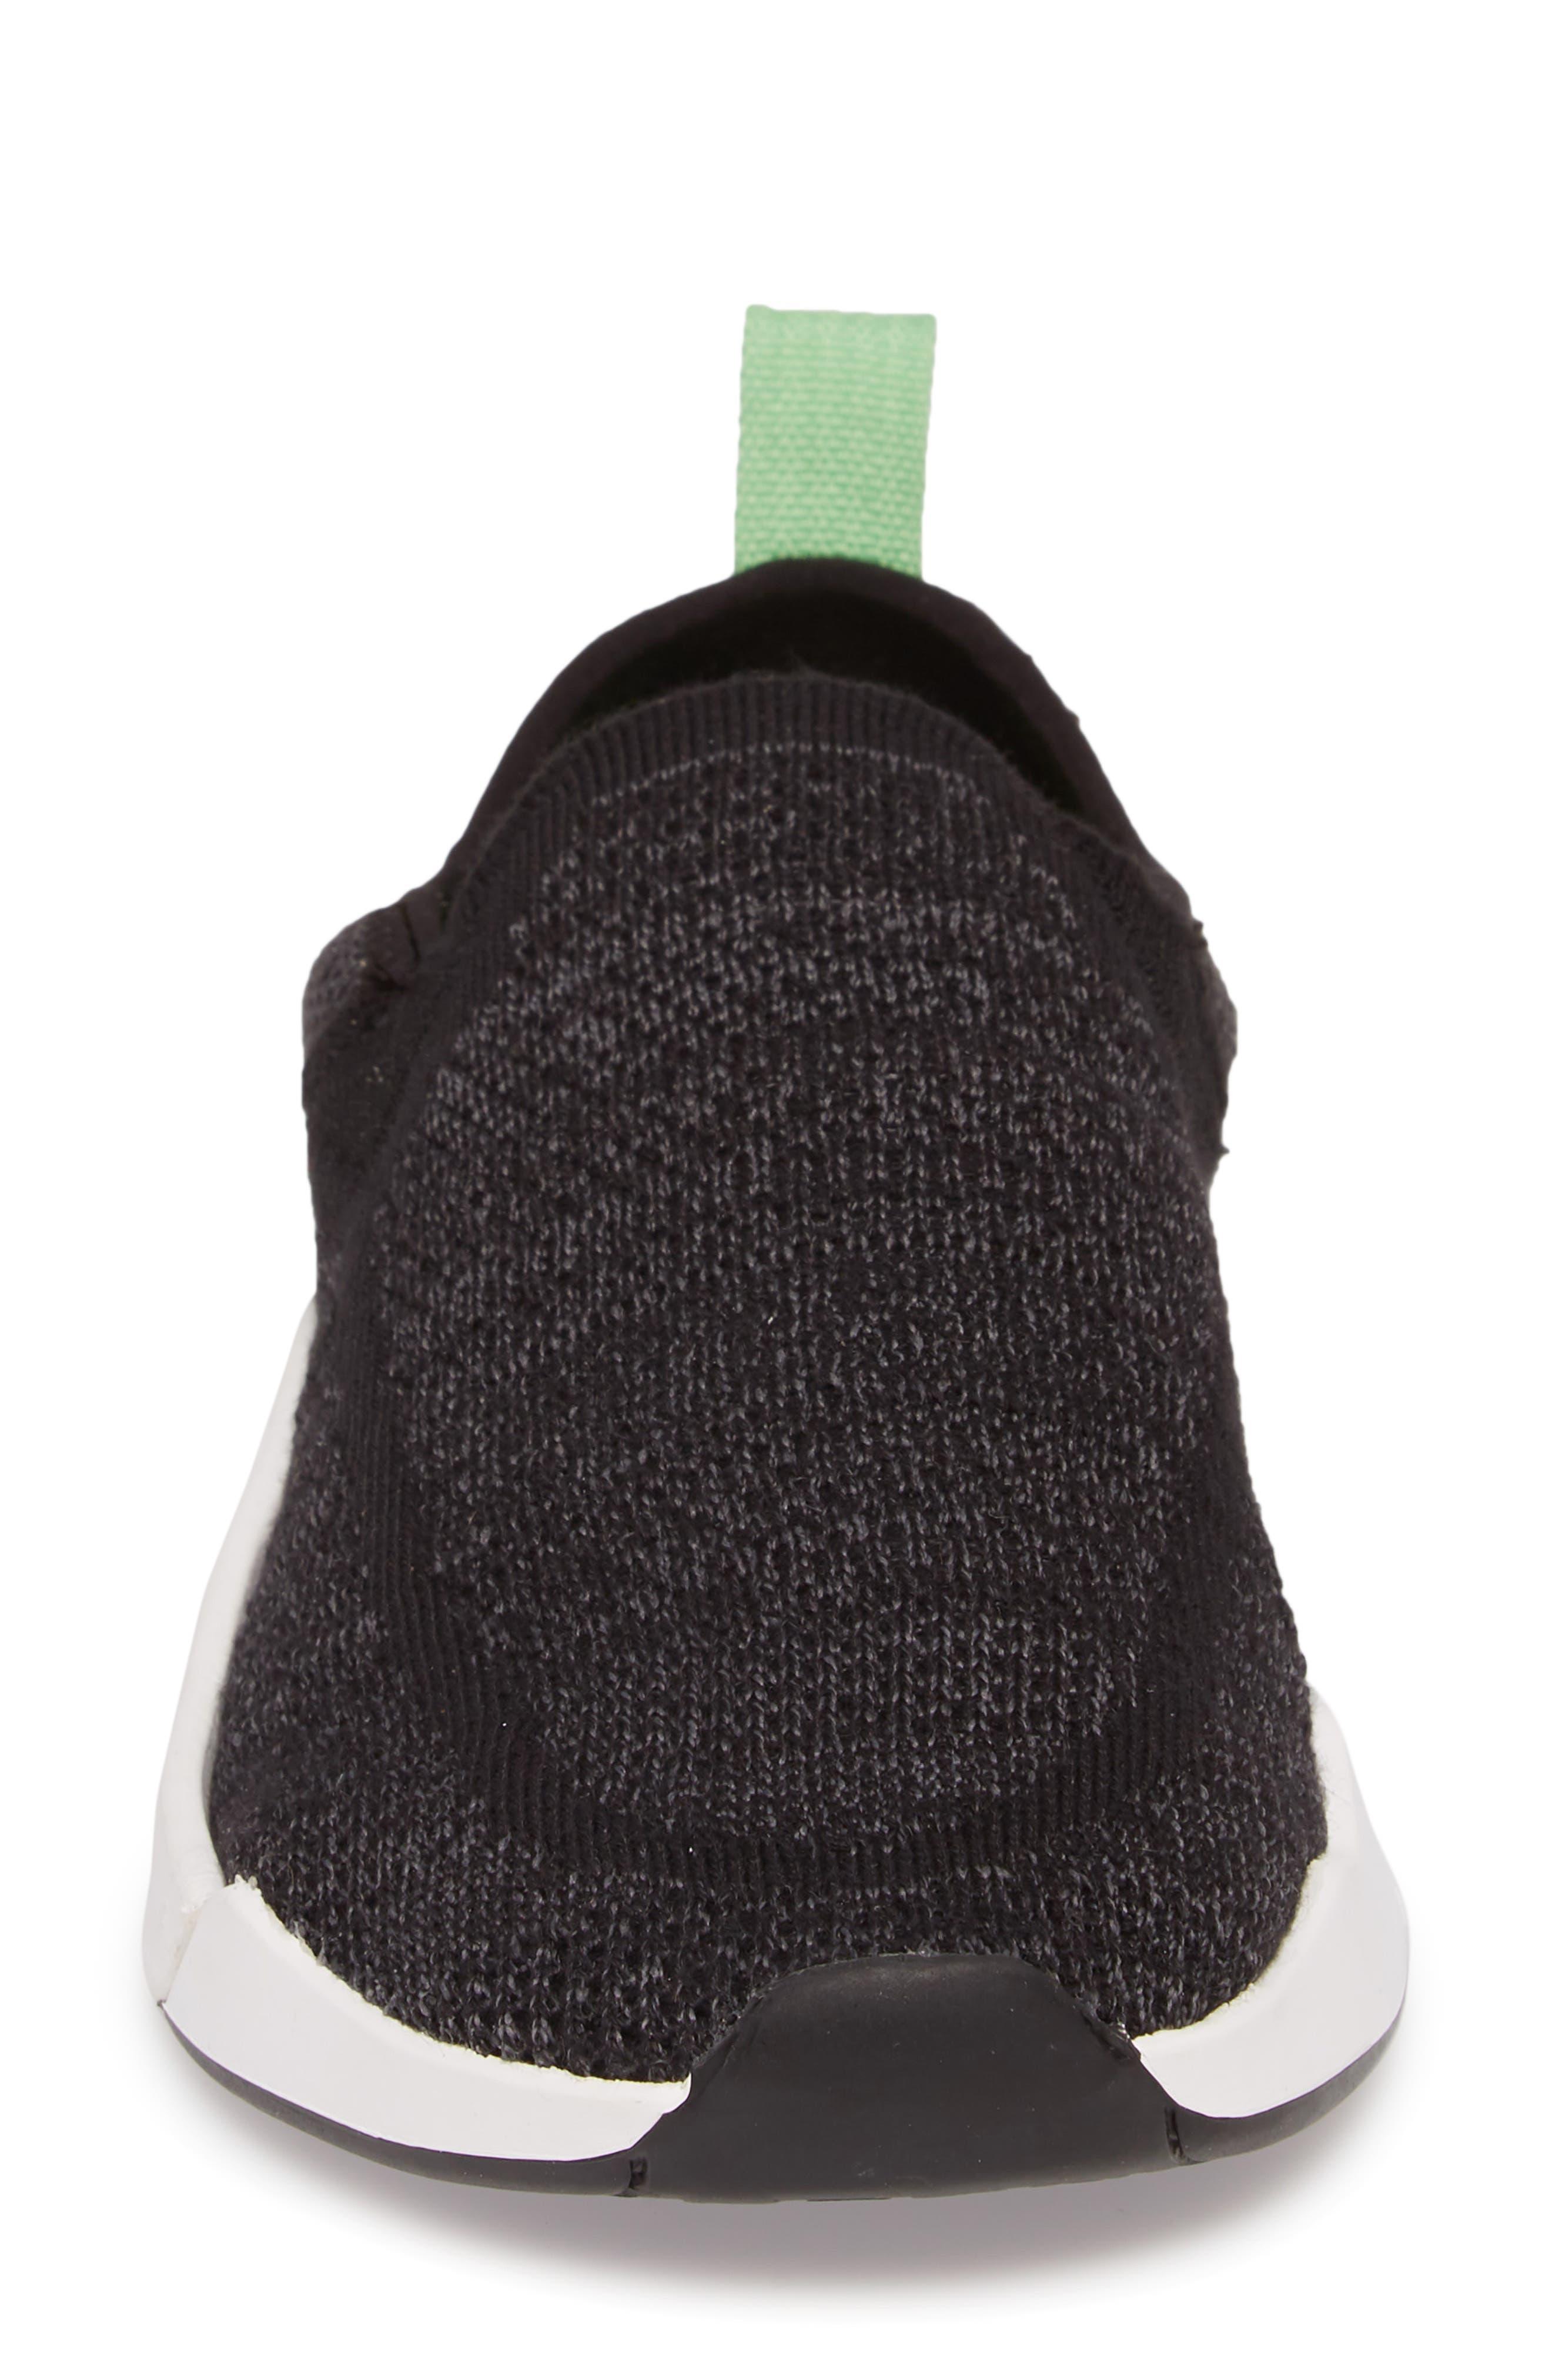 SANUK, Chiba Quest Knit Slip-On Sneaker, Alternate thumbnail 4, color, BLACK